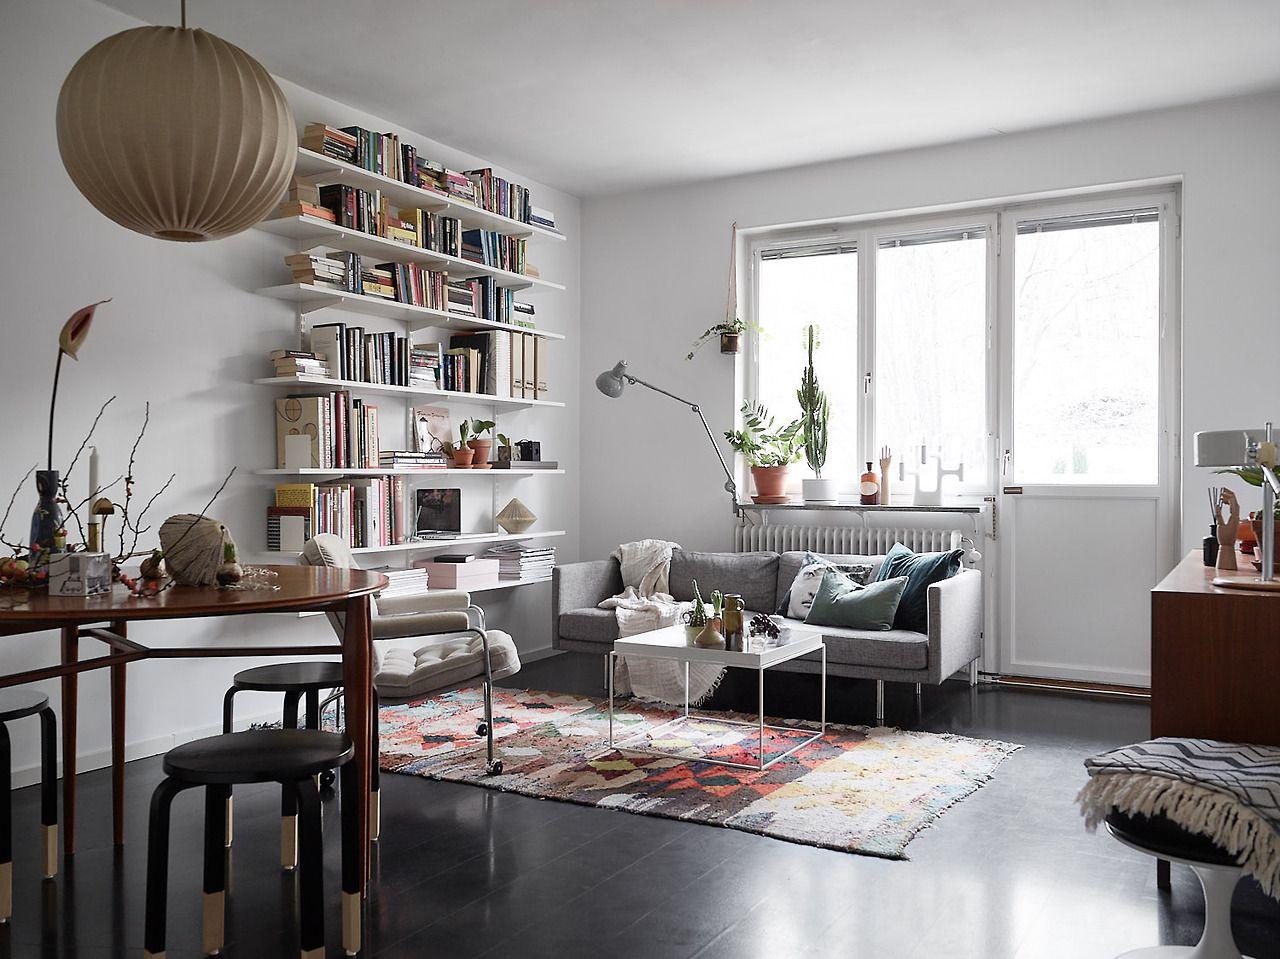 Scandinavian Living Room With Modular Shelves For Books And Art